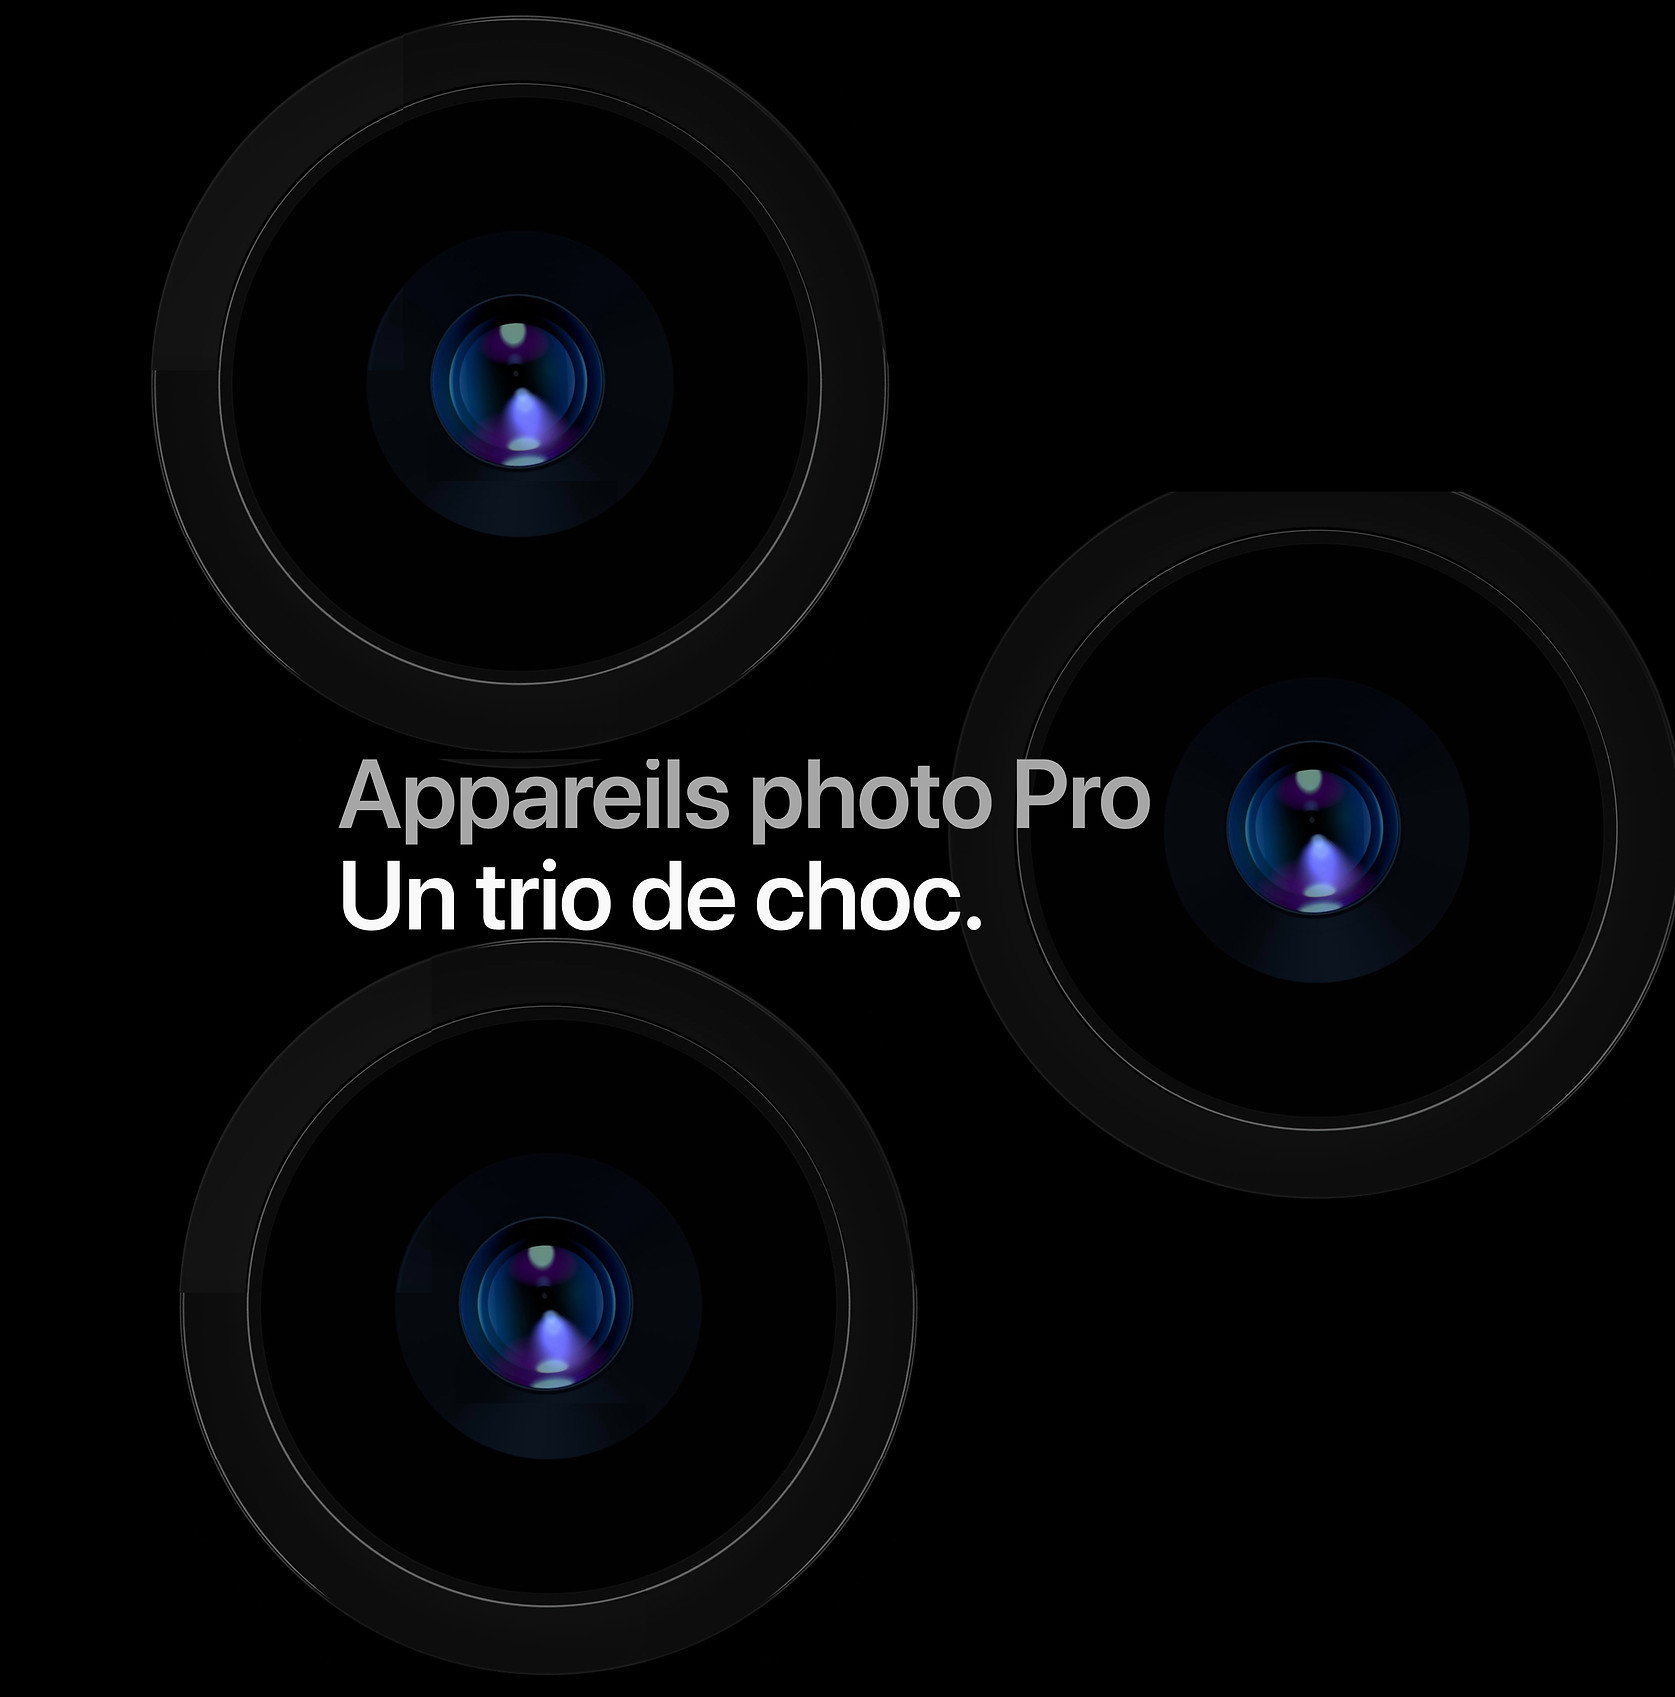 iPhone 11 PRO V3 - copie.jpg